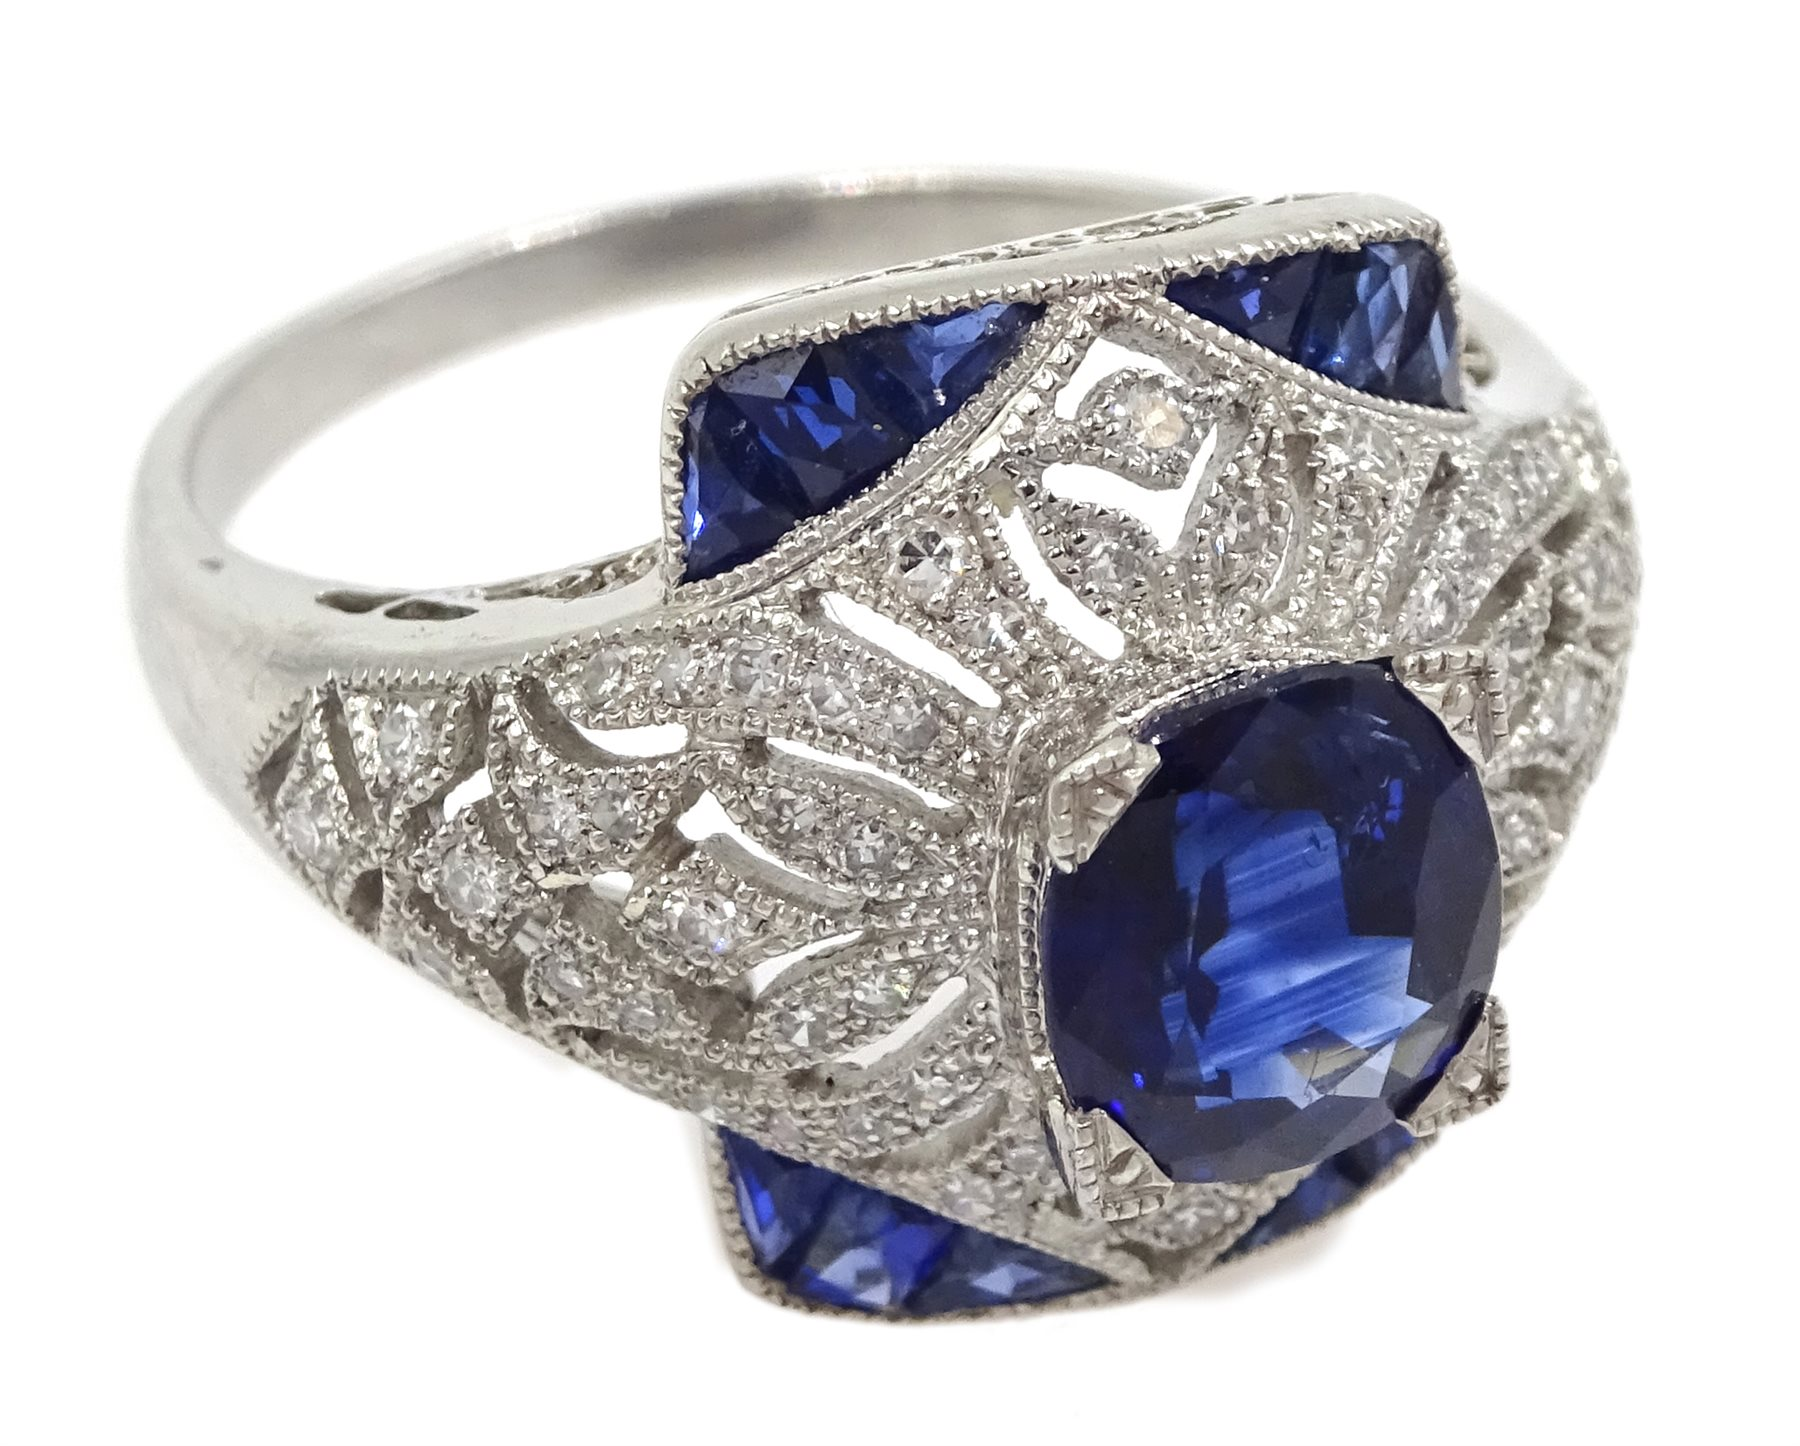 Platinum sapphire and diamond dress ring - Image 3 of 6